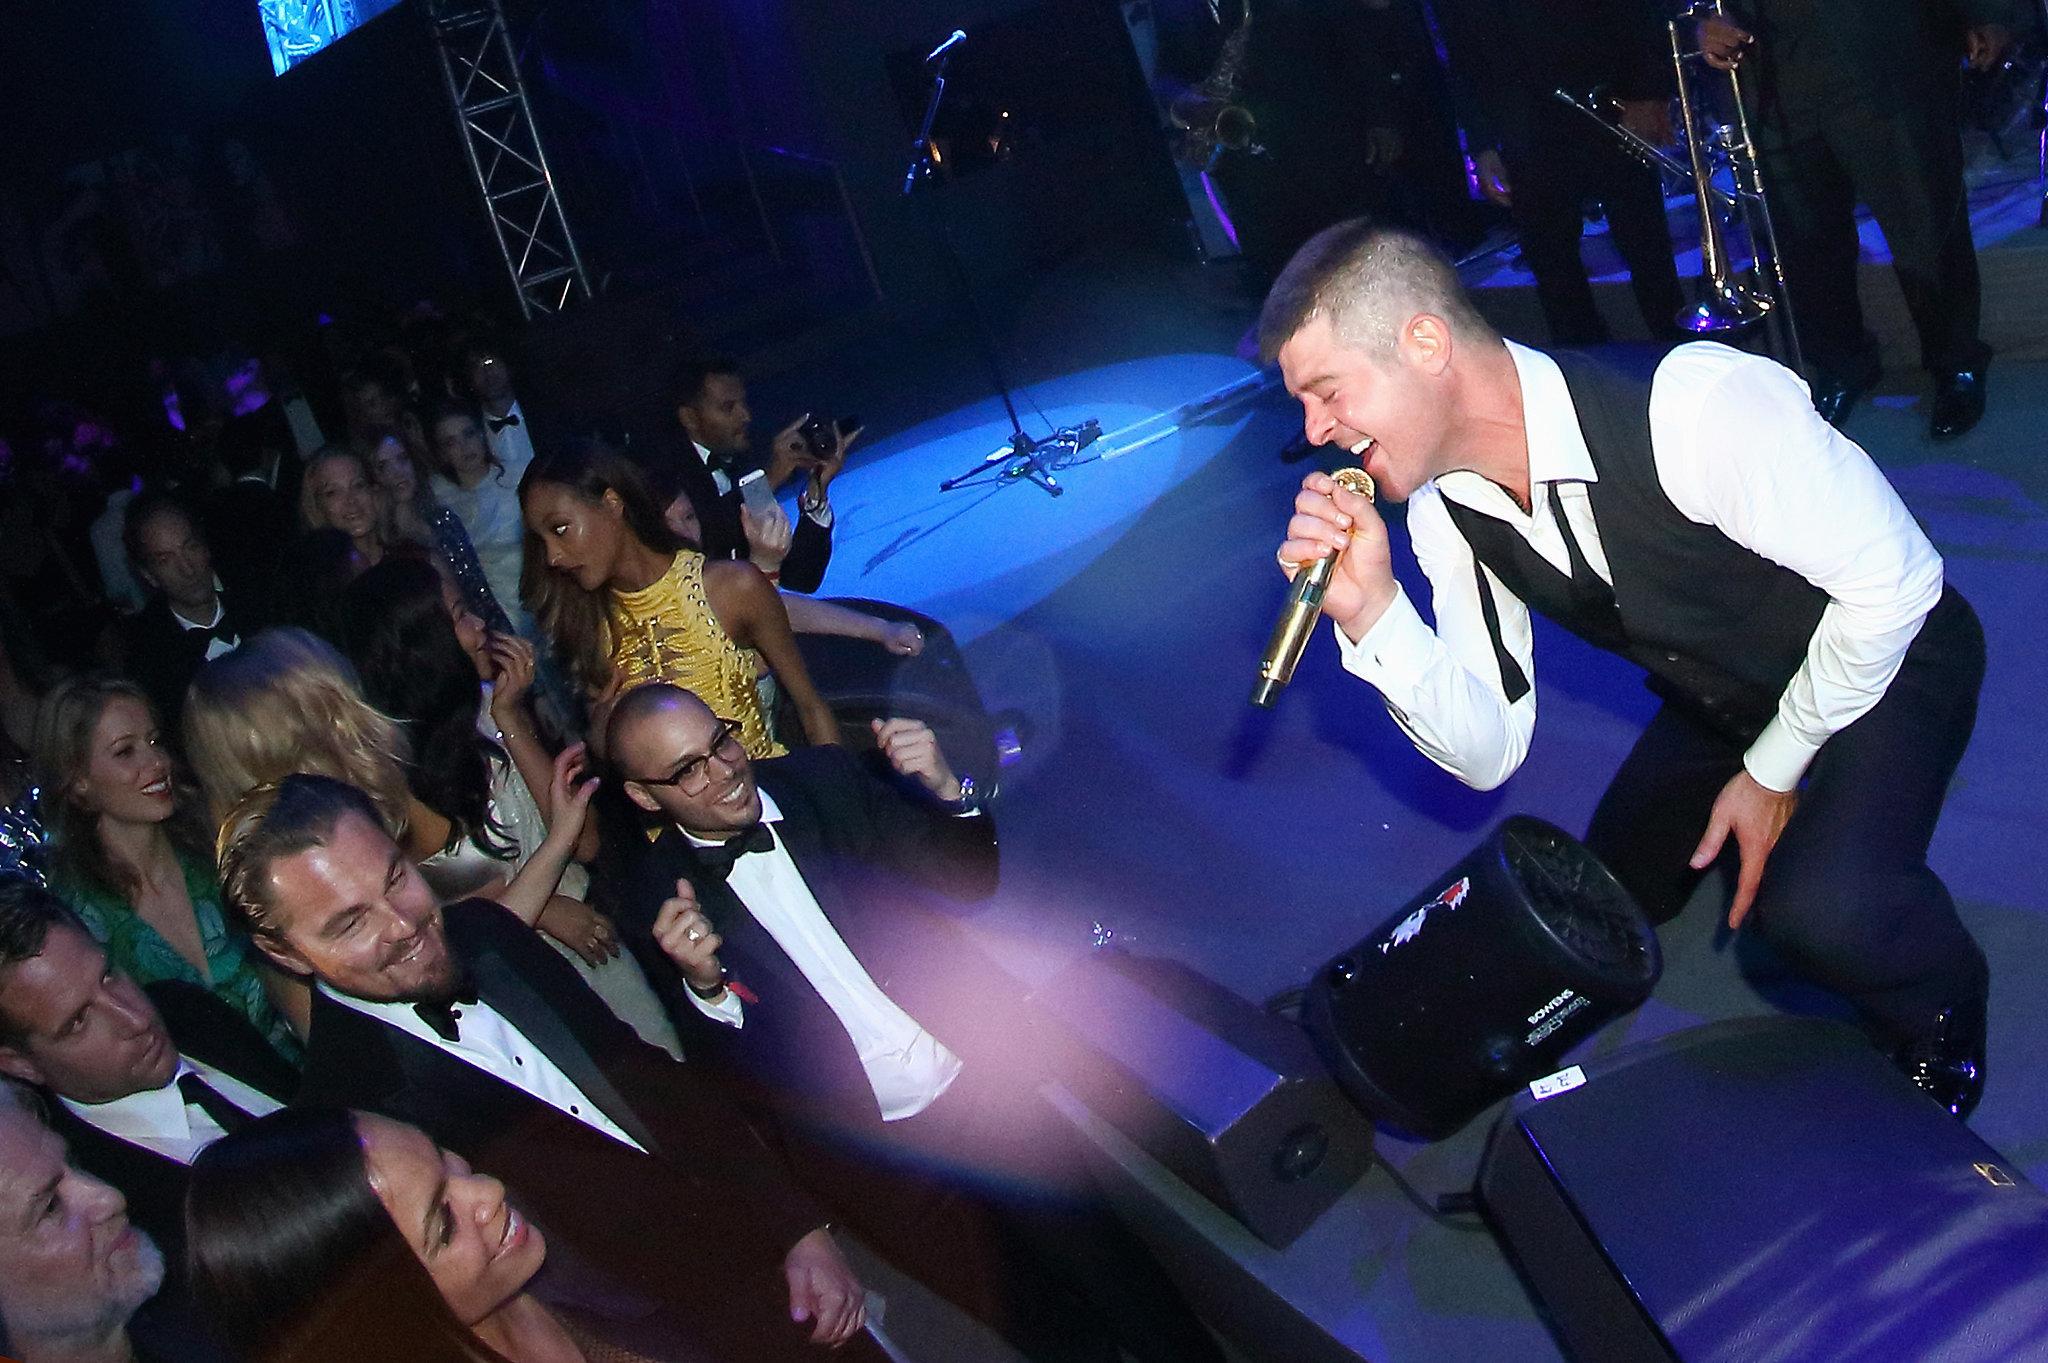 Leonardo DiCaprio watched Robin Thicke perform at the amfAR gala.